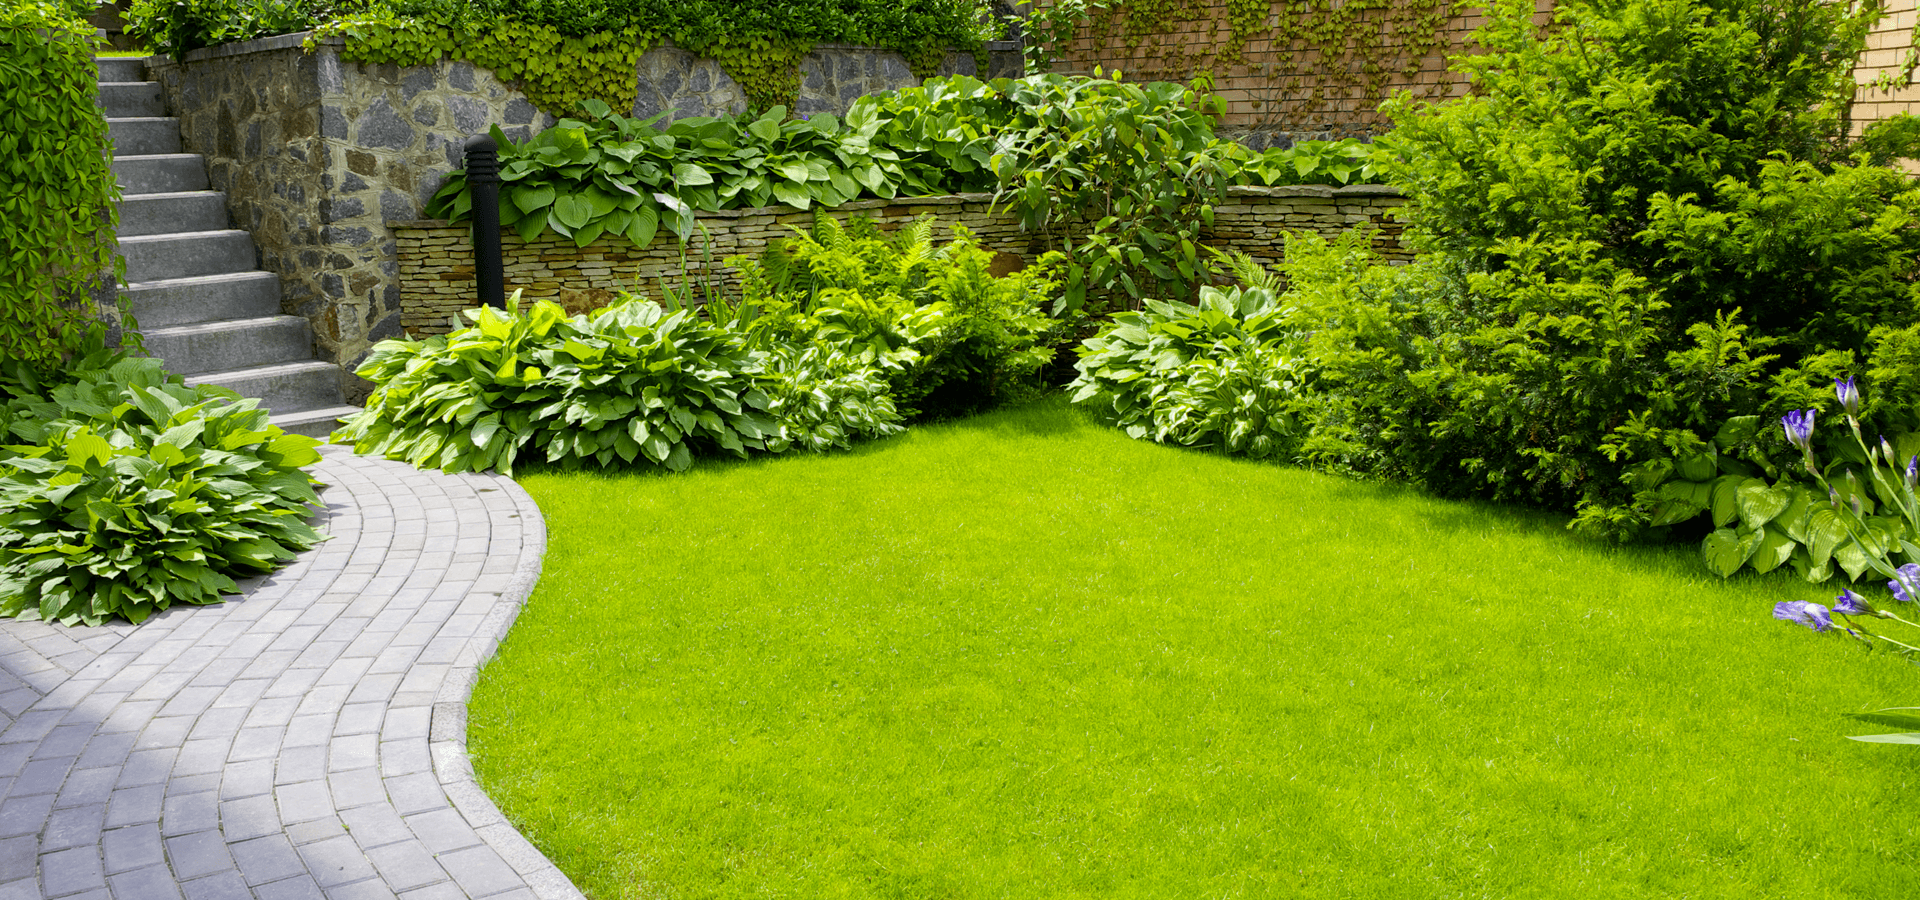 Choosing the best garden stones for your home